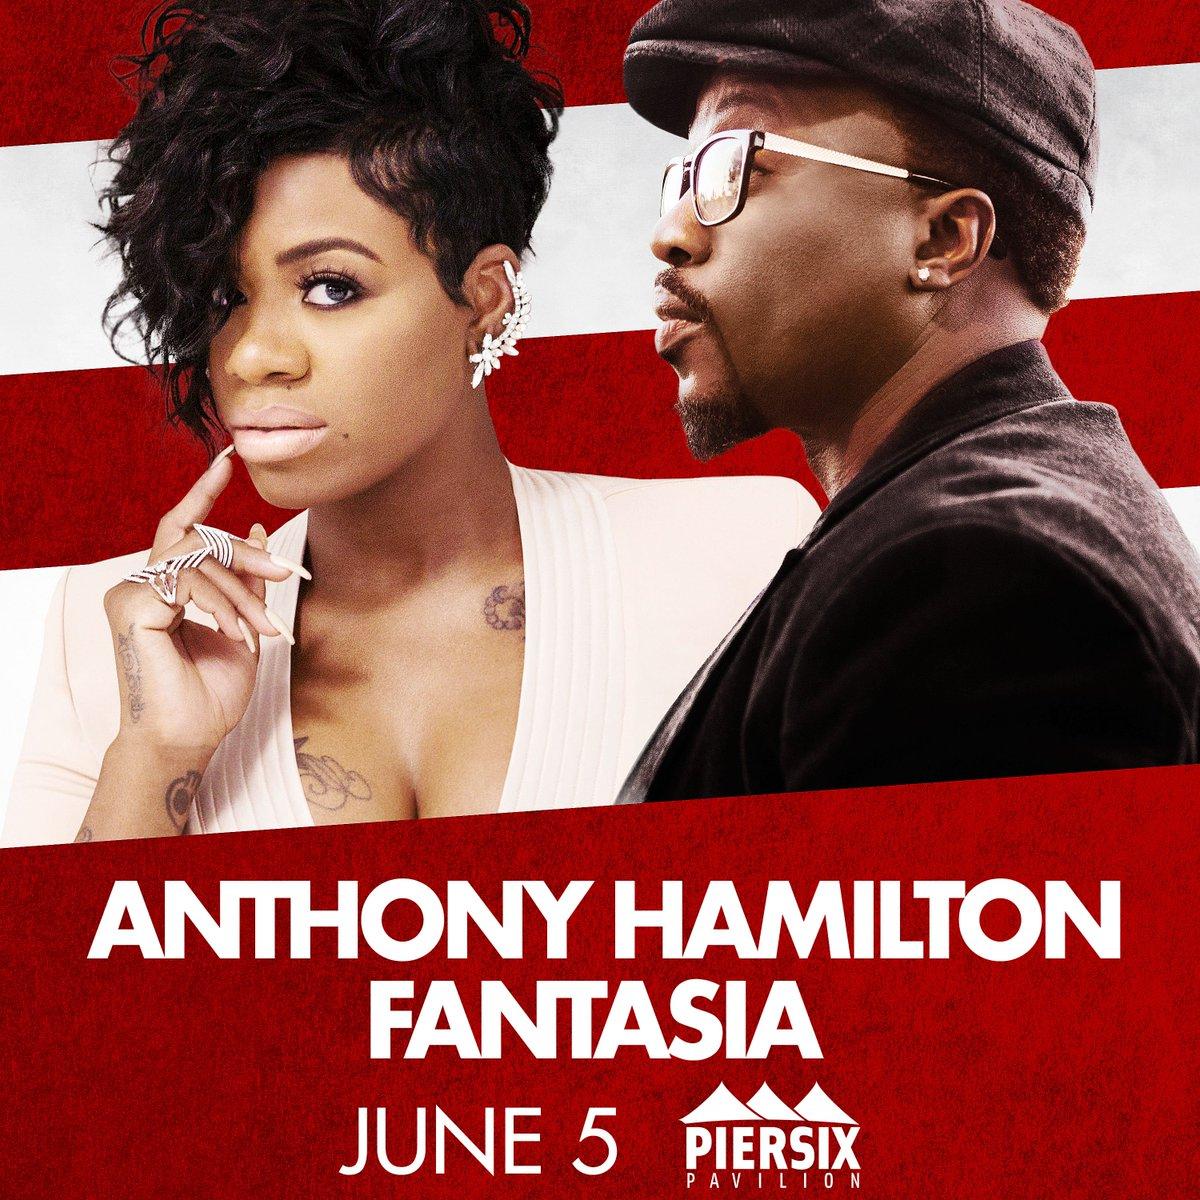 **JUST ANNOUNCED** 2nd show added @HamiltonAnthony & @TasiasWord June 5 - tix on sale this Friday 10 AM https://t.co/vRstrzZAvI